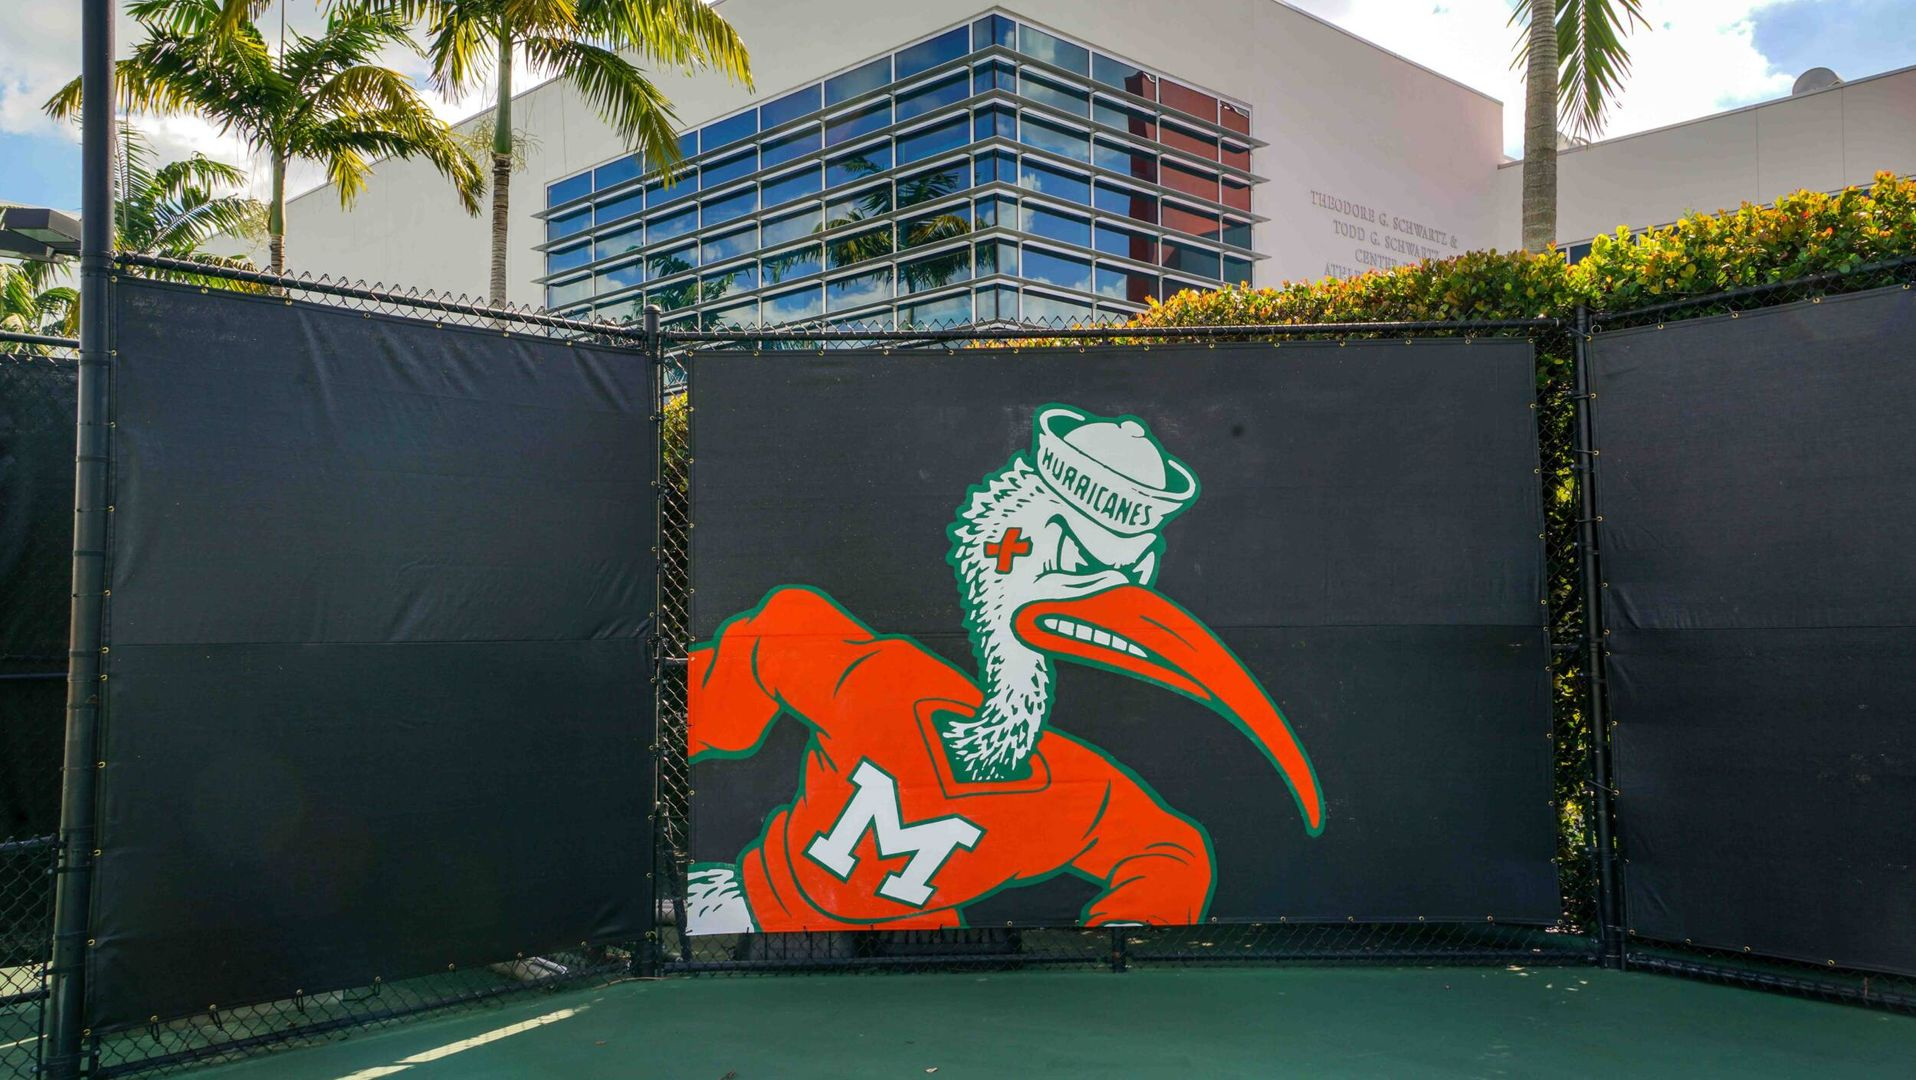 Miami Men's Tennis Match Postponed